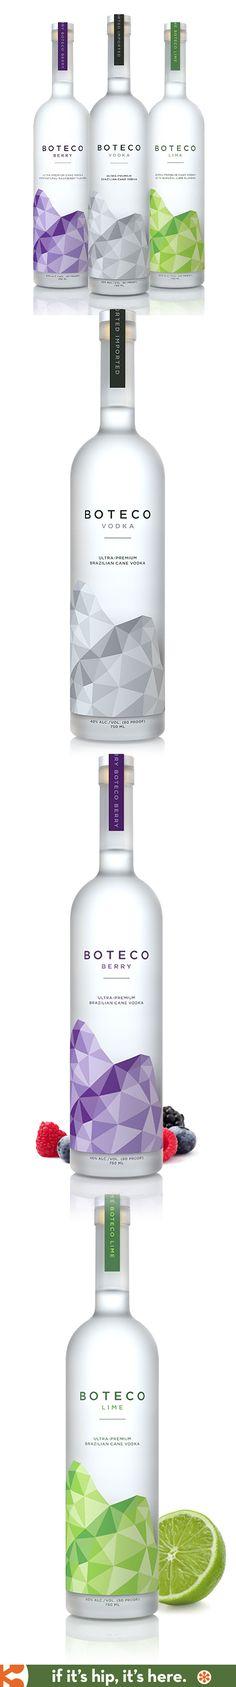 Brazilian's Premium Cane Vodka, Boteco Vodka, comes in beautiful bottles designed by Shatterbox Studios.